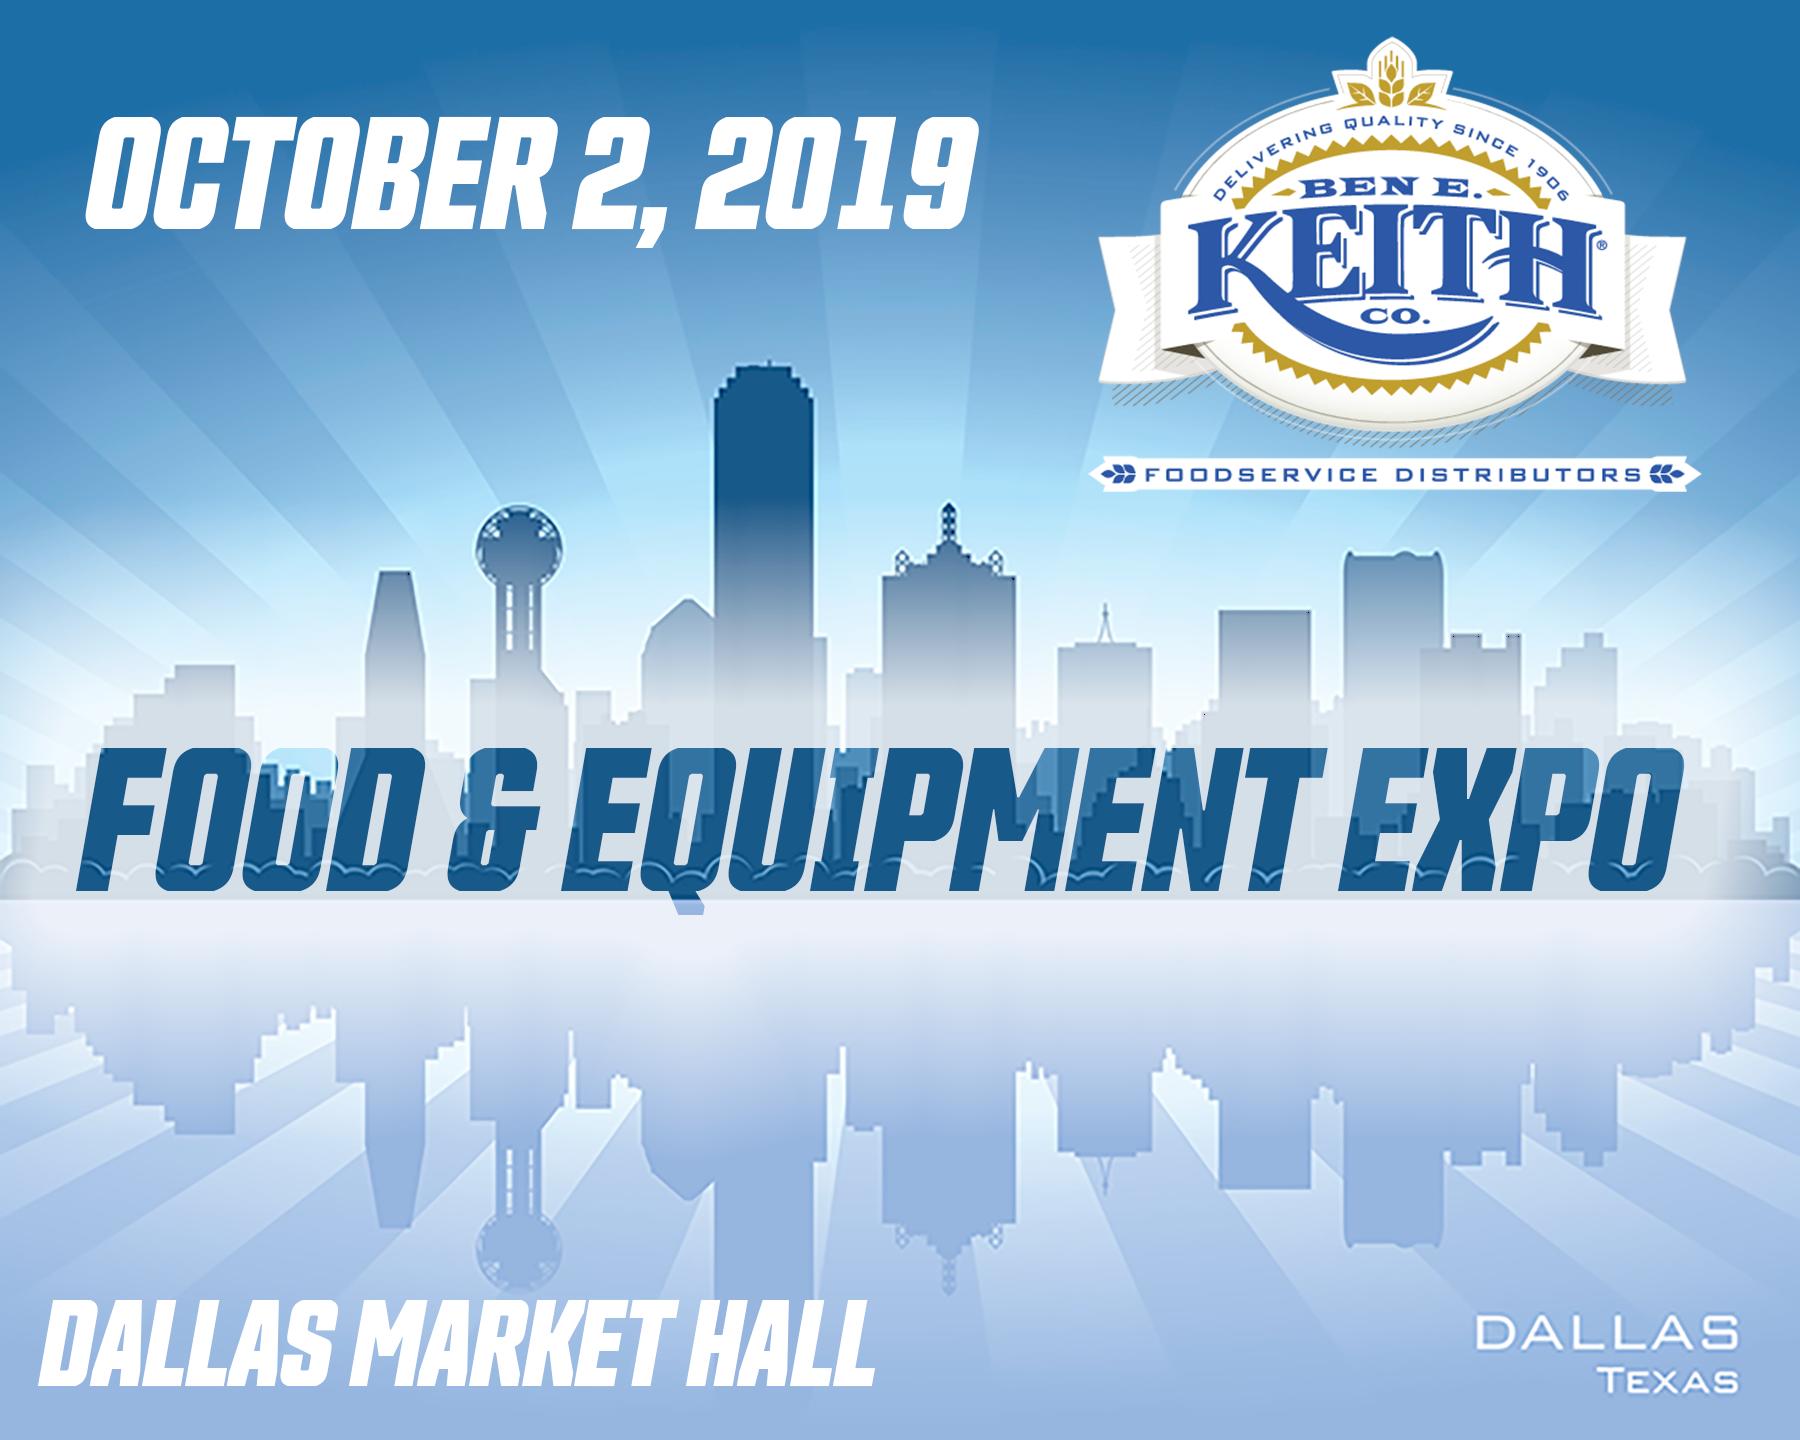 Dallas / Fort Worth Fall Expo 2019